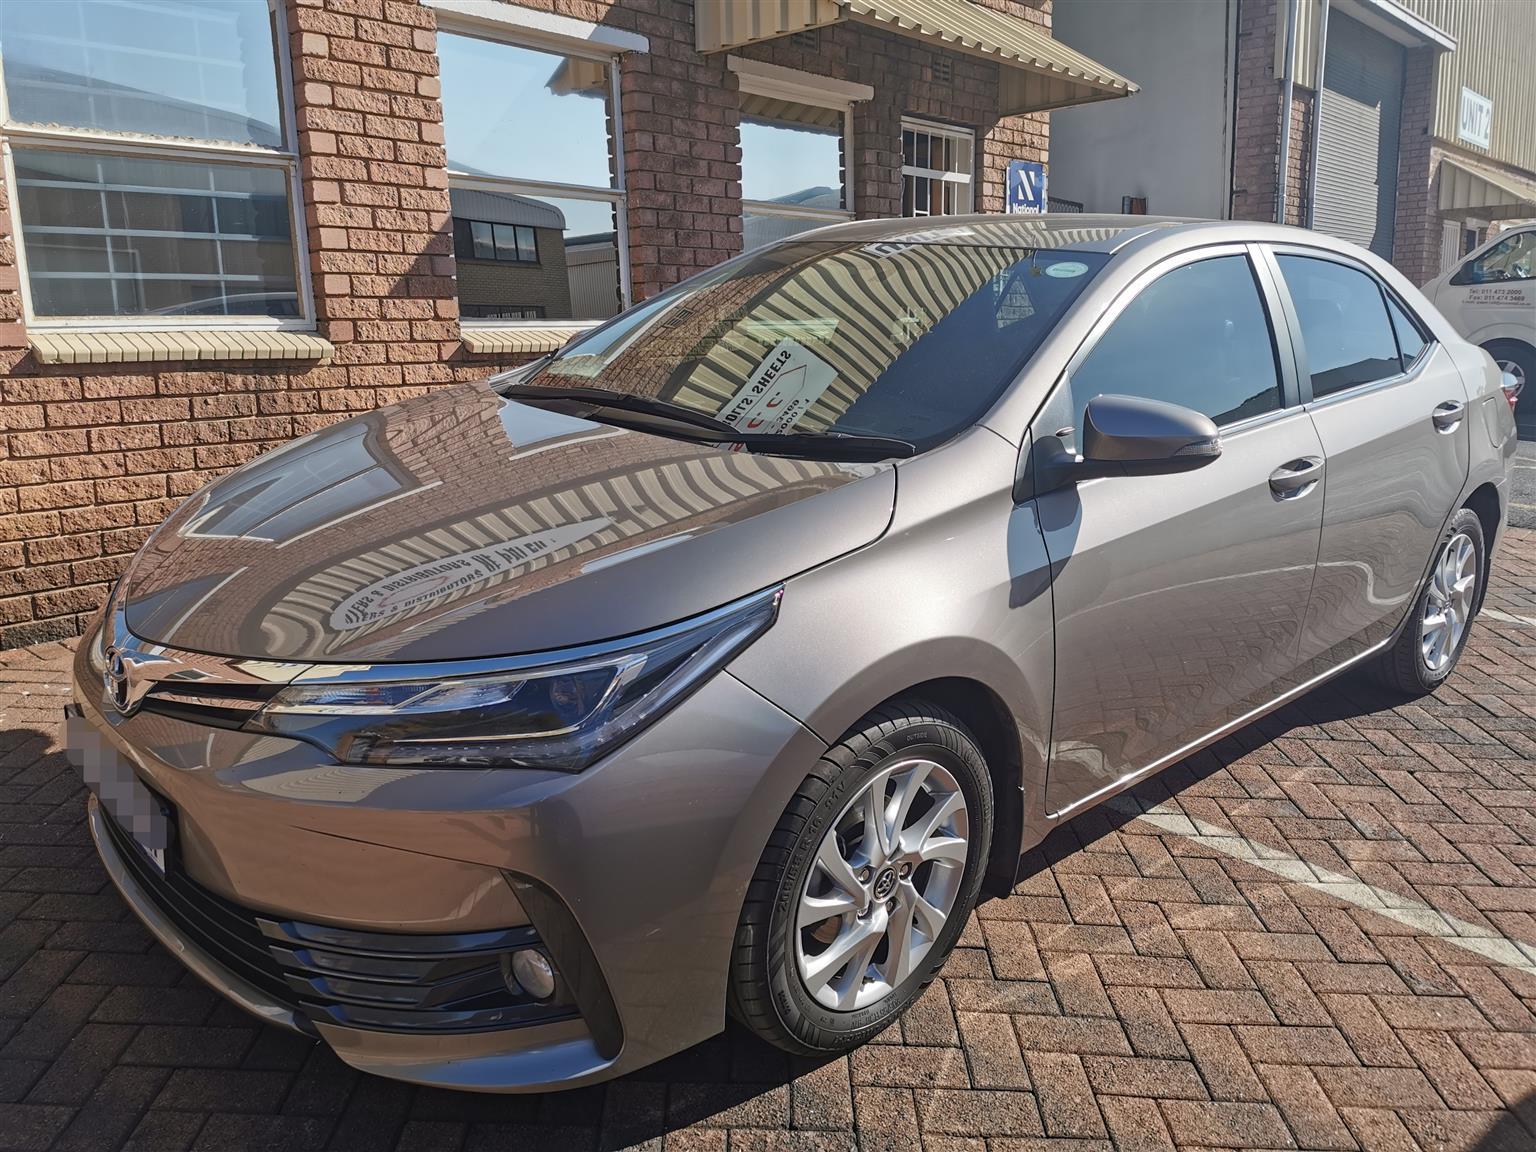 2019 Toyota Corolla 1.8 Exclusive automatic